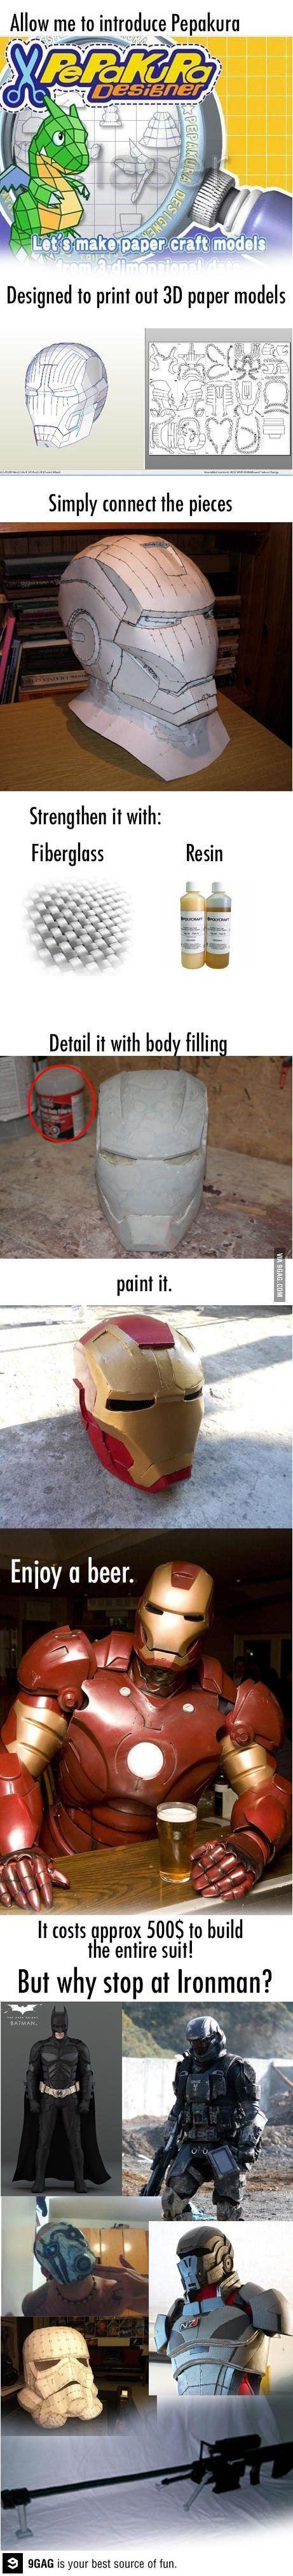 Pepakura - print out 3D paper models. Made Iron man mask.